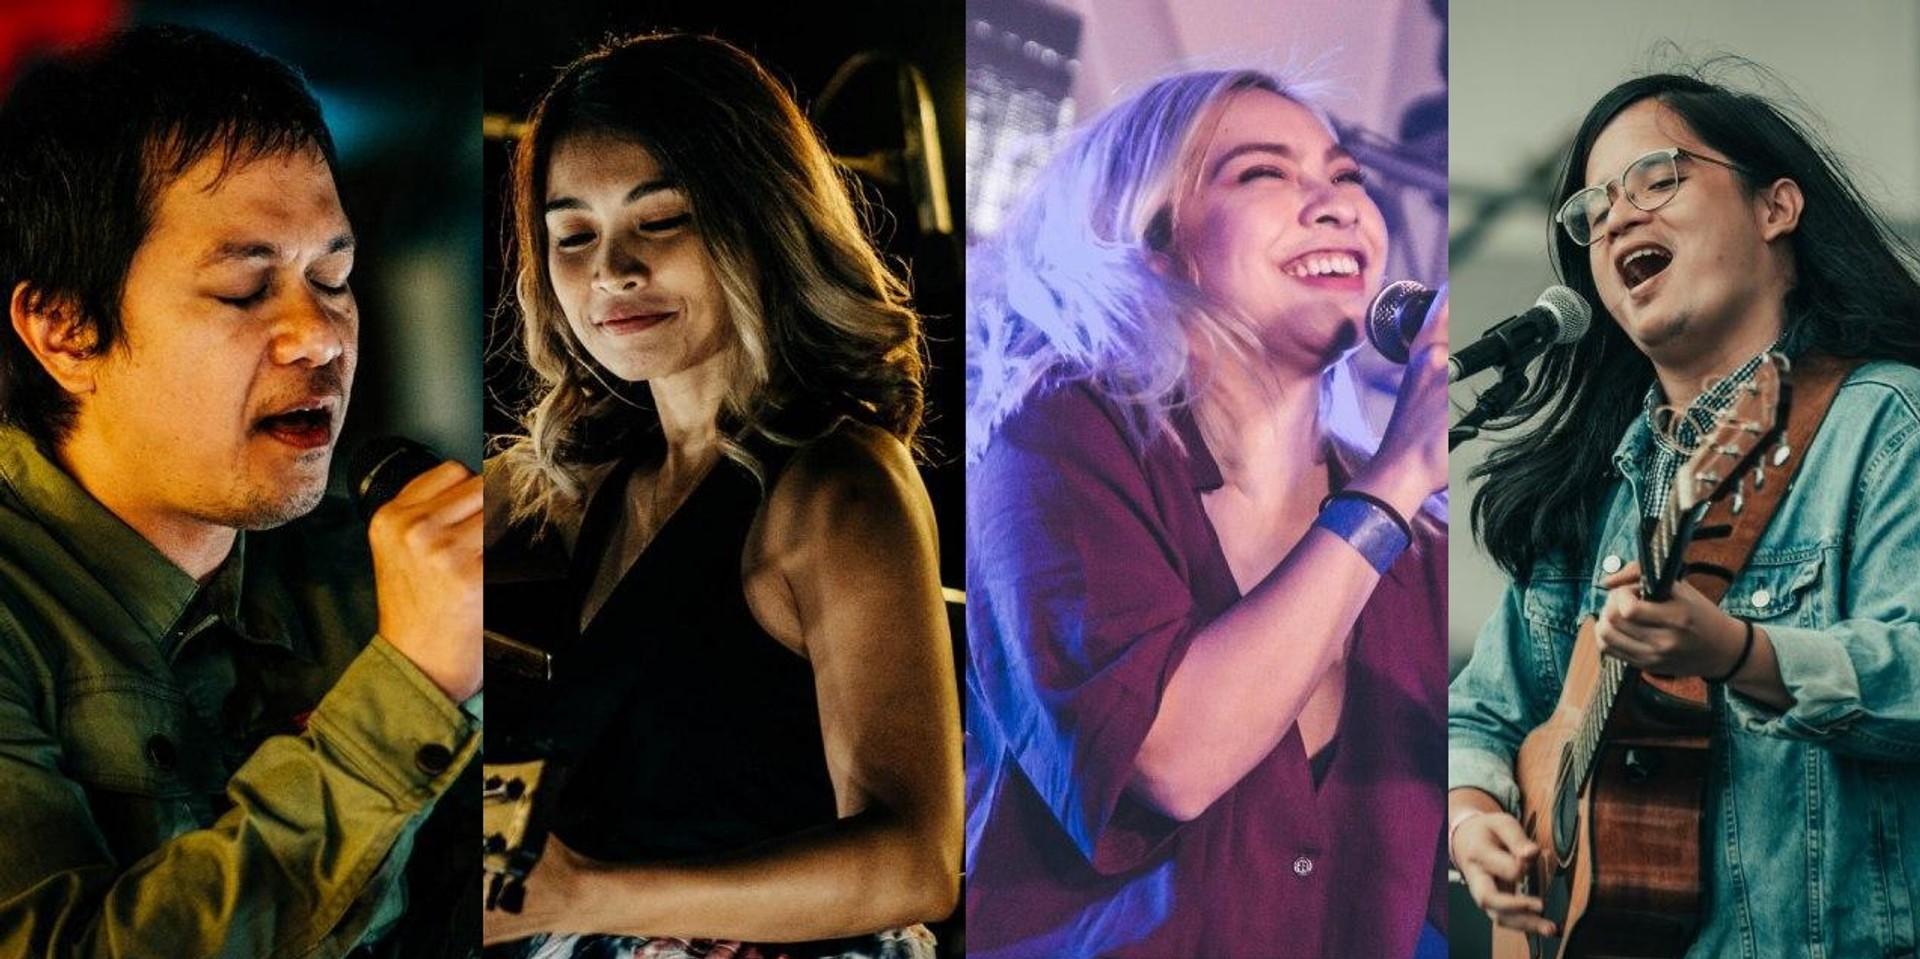 Cheats, Moonstar88, Raymund Marasigan, Ben&Ben, and more release new music – listen